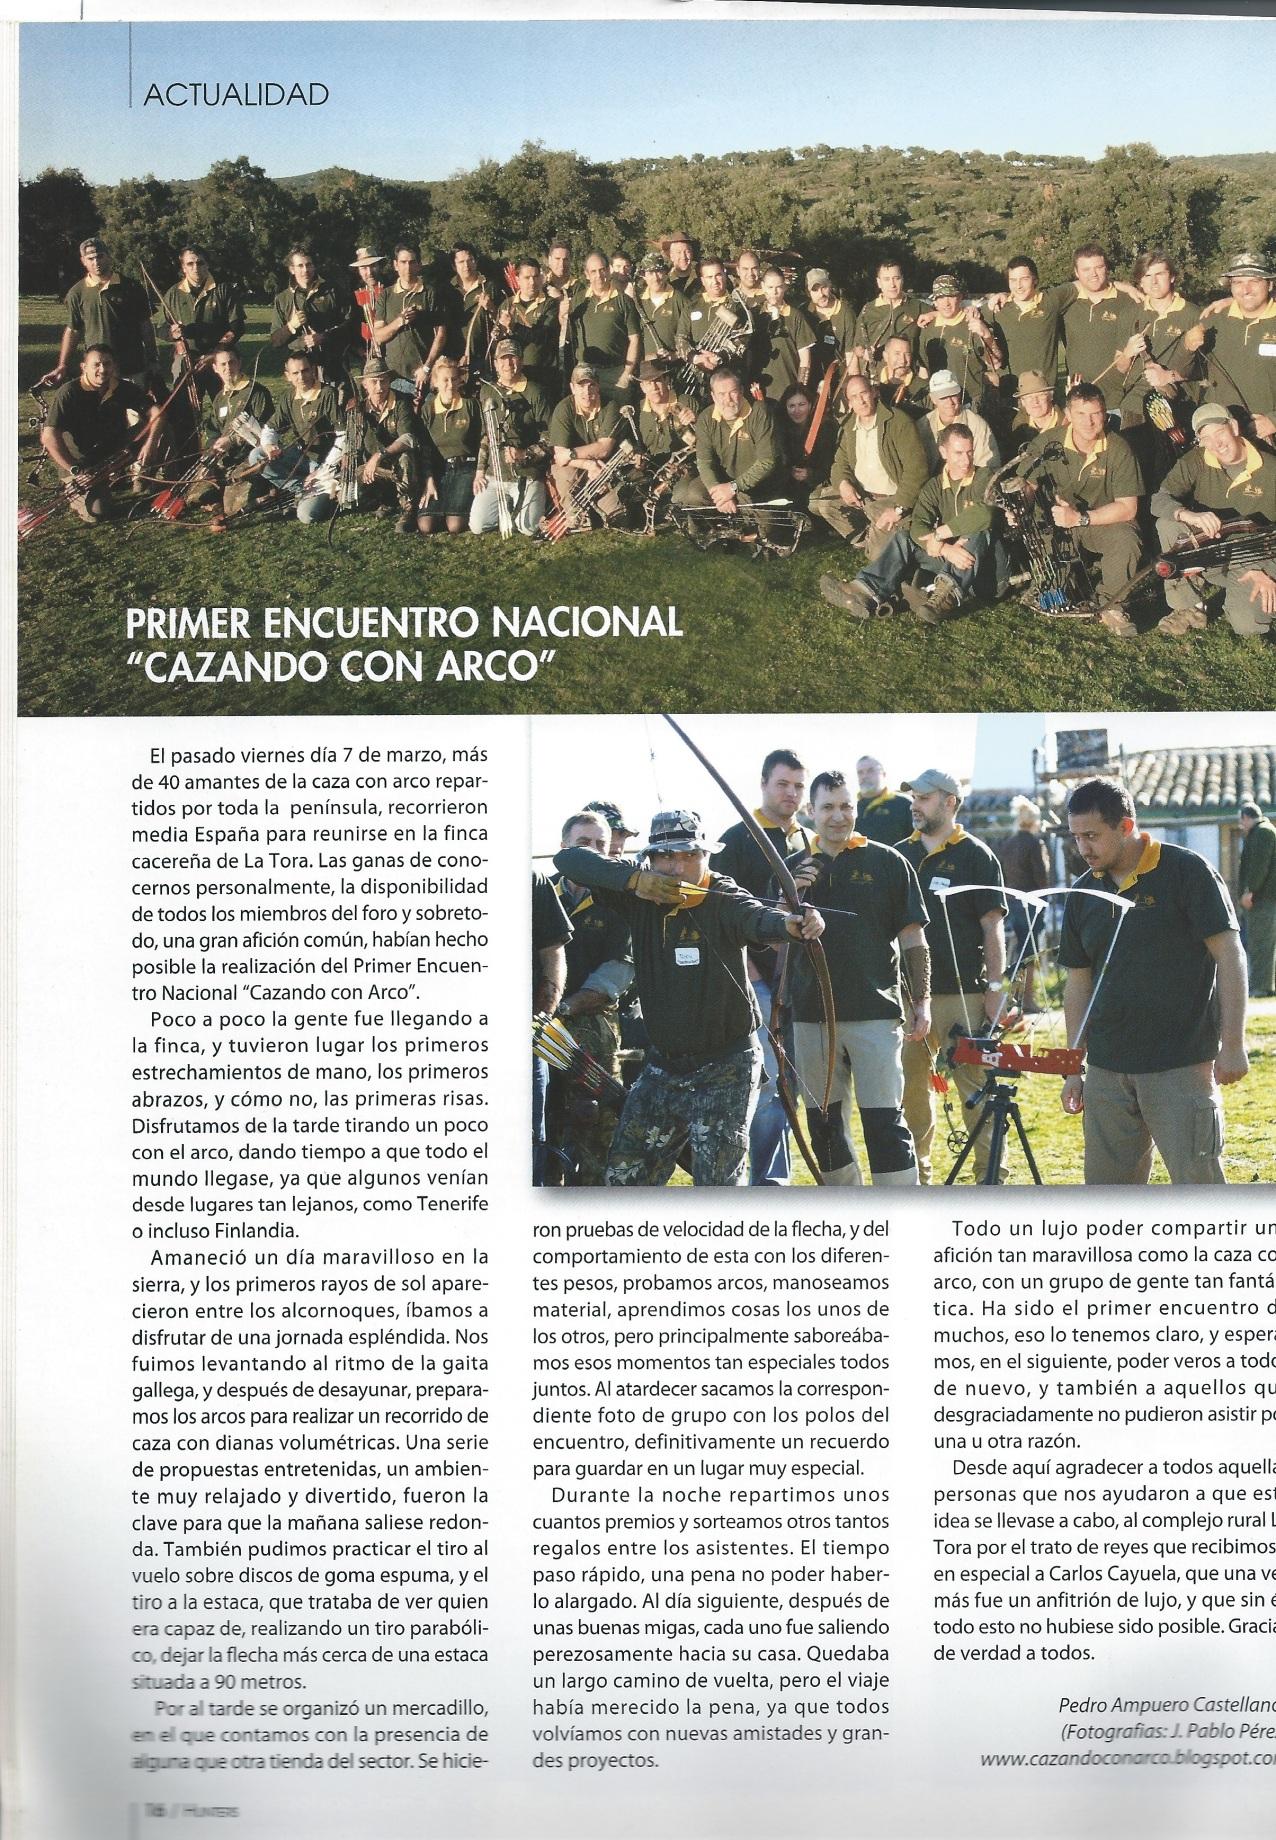 Hunters april 2008 - 1